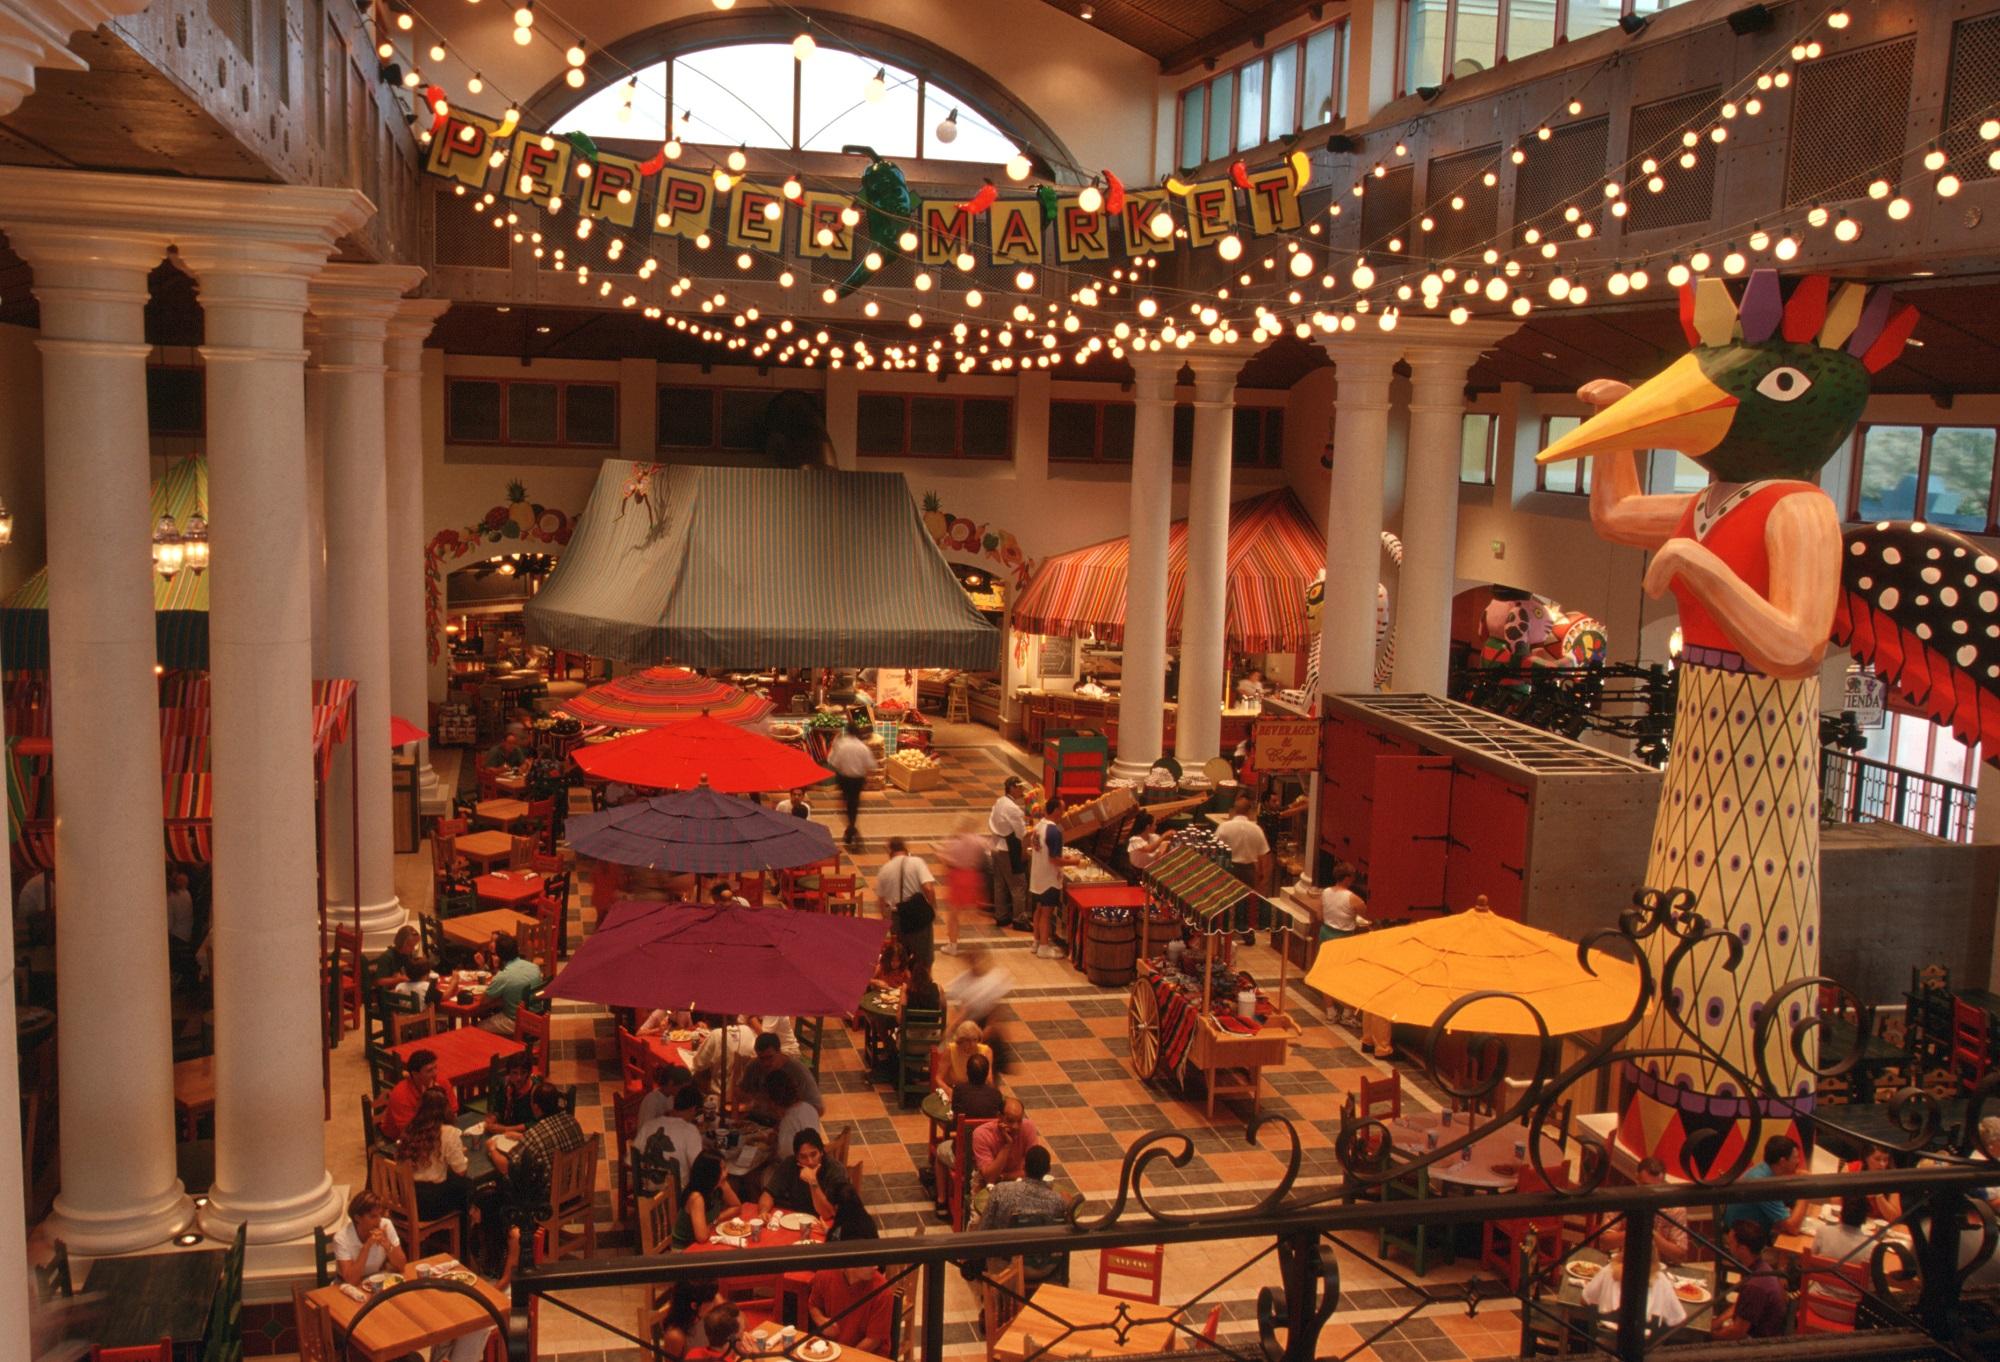 Pepper Market Food Court at Disney's Coronado Springs Resort